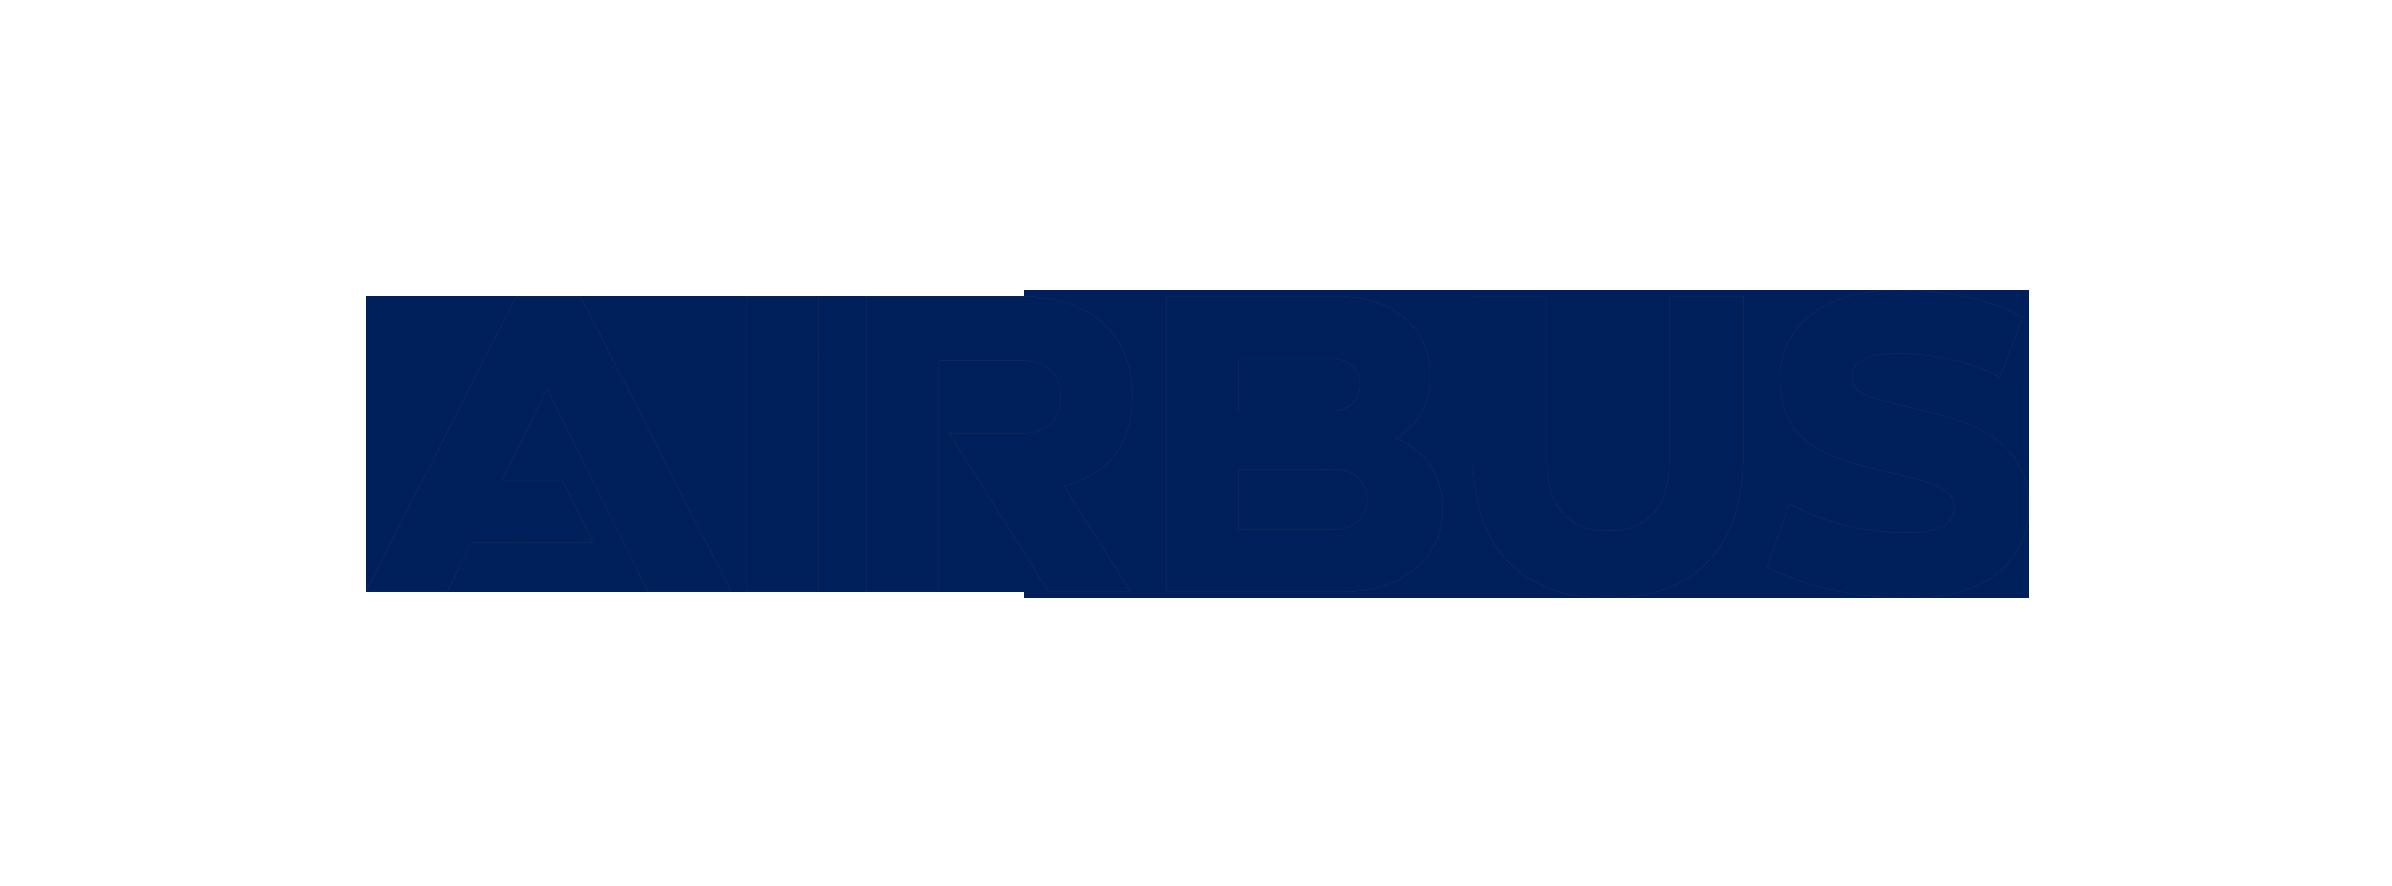 Airbus select Ascertia technology for digital signature initiative